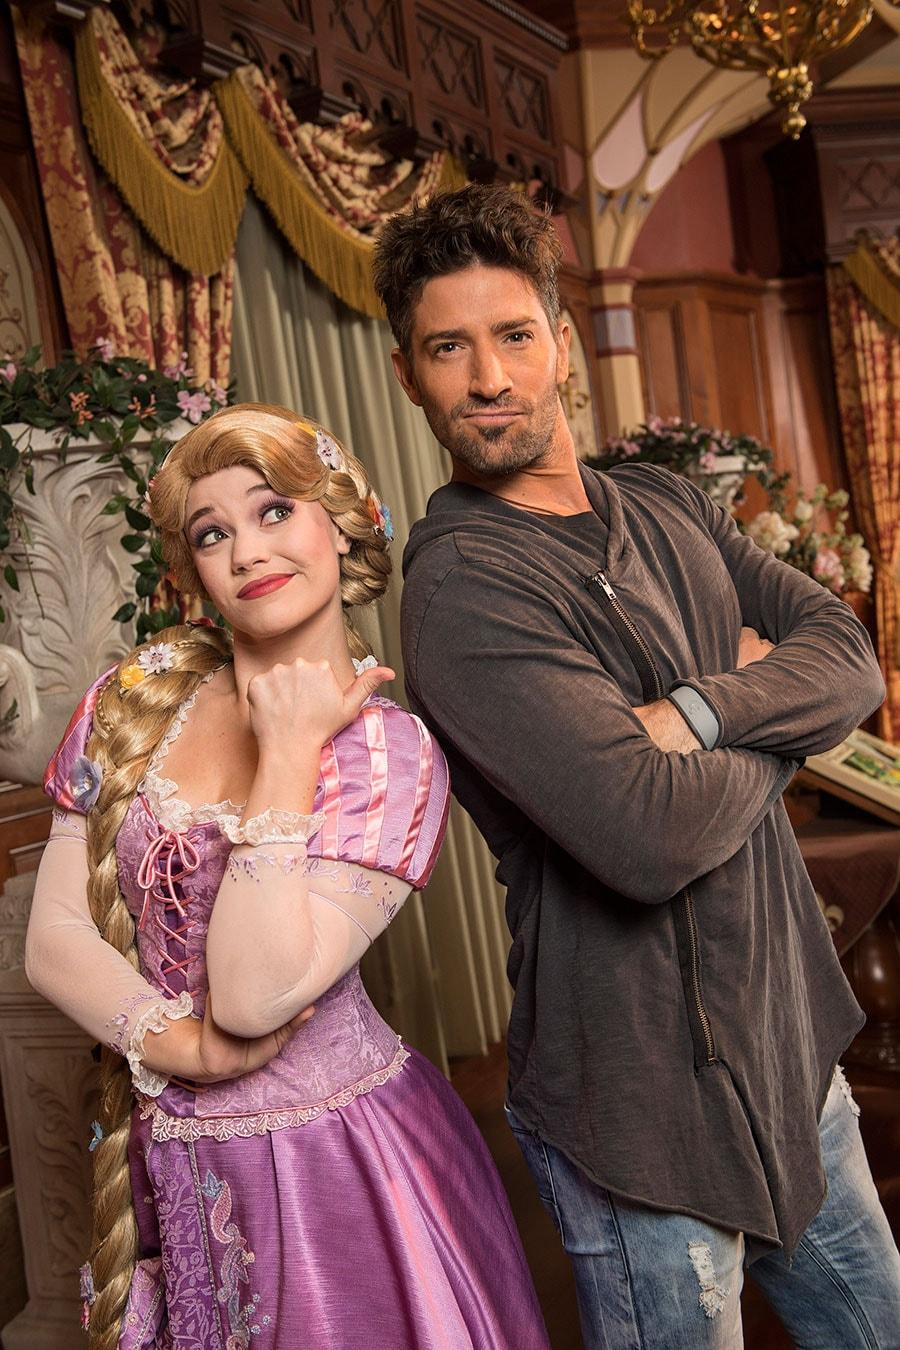 #DisneyFamilia: Celebridades start the New Year at Walt Disney World